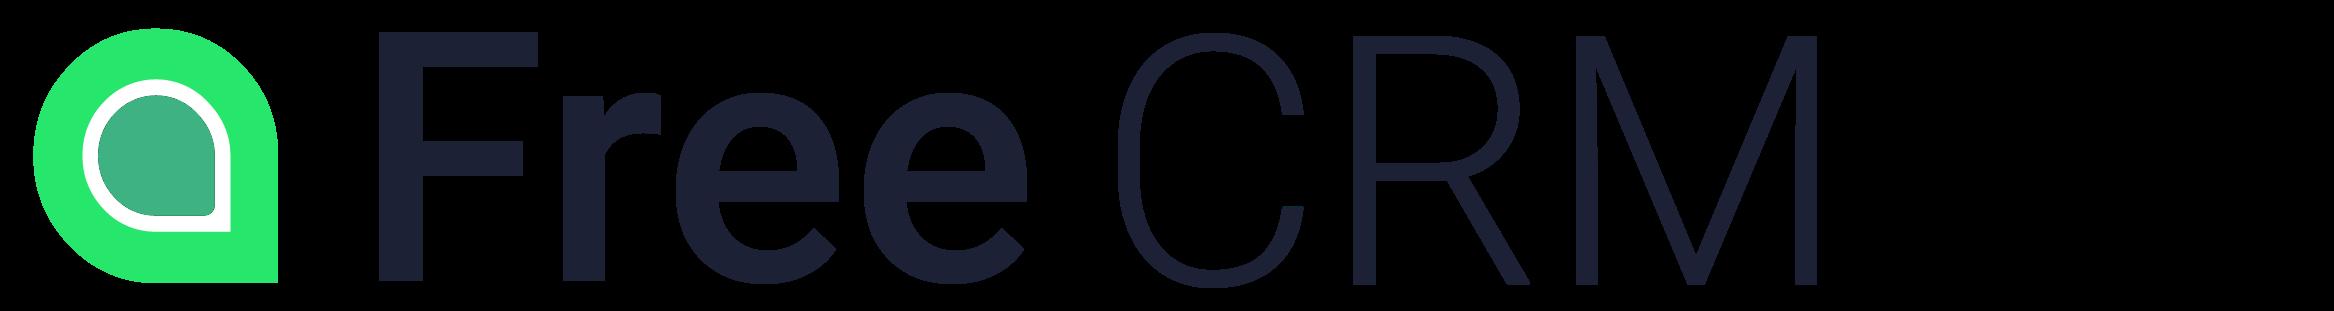 gleansell logo